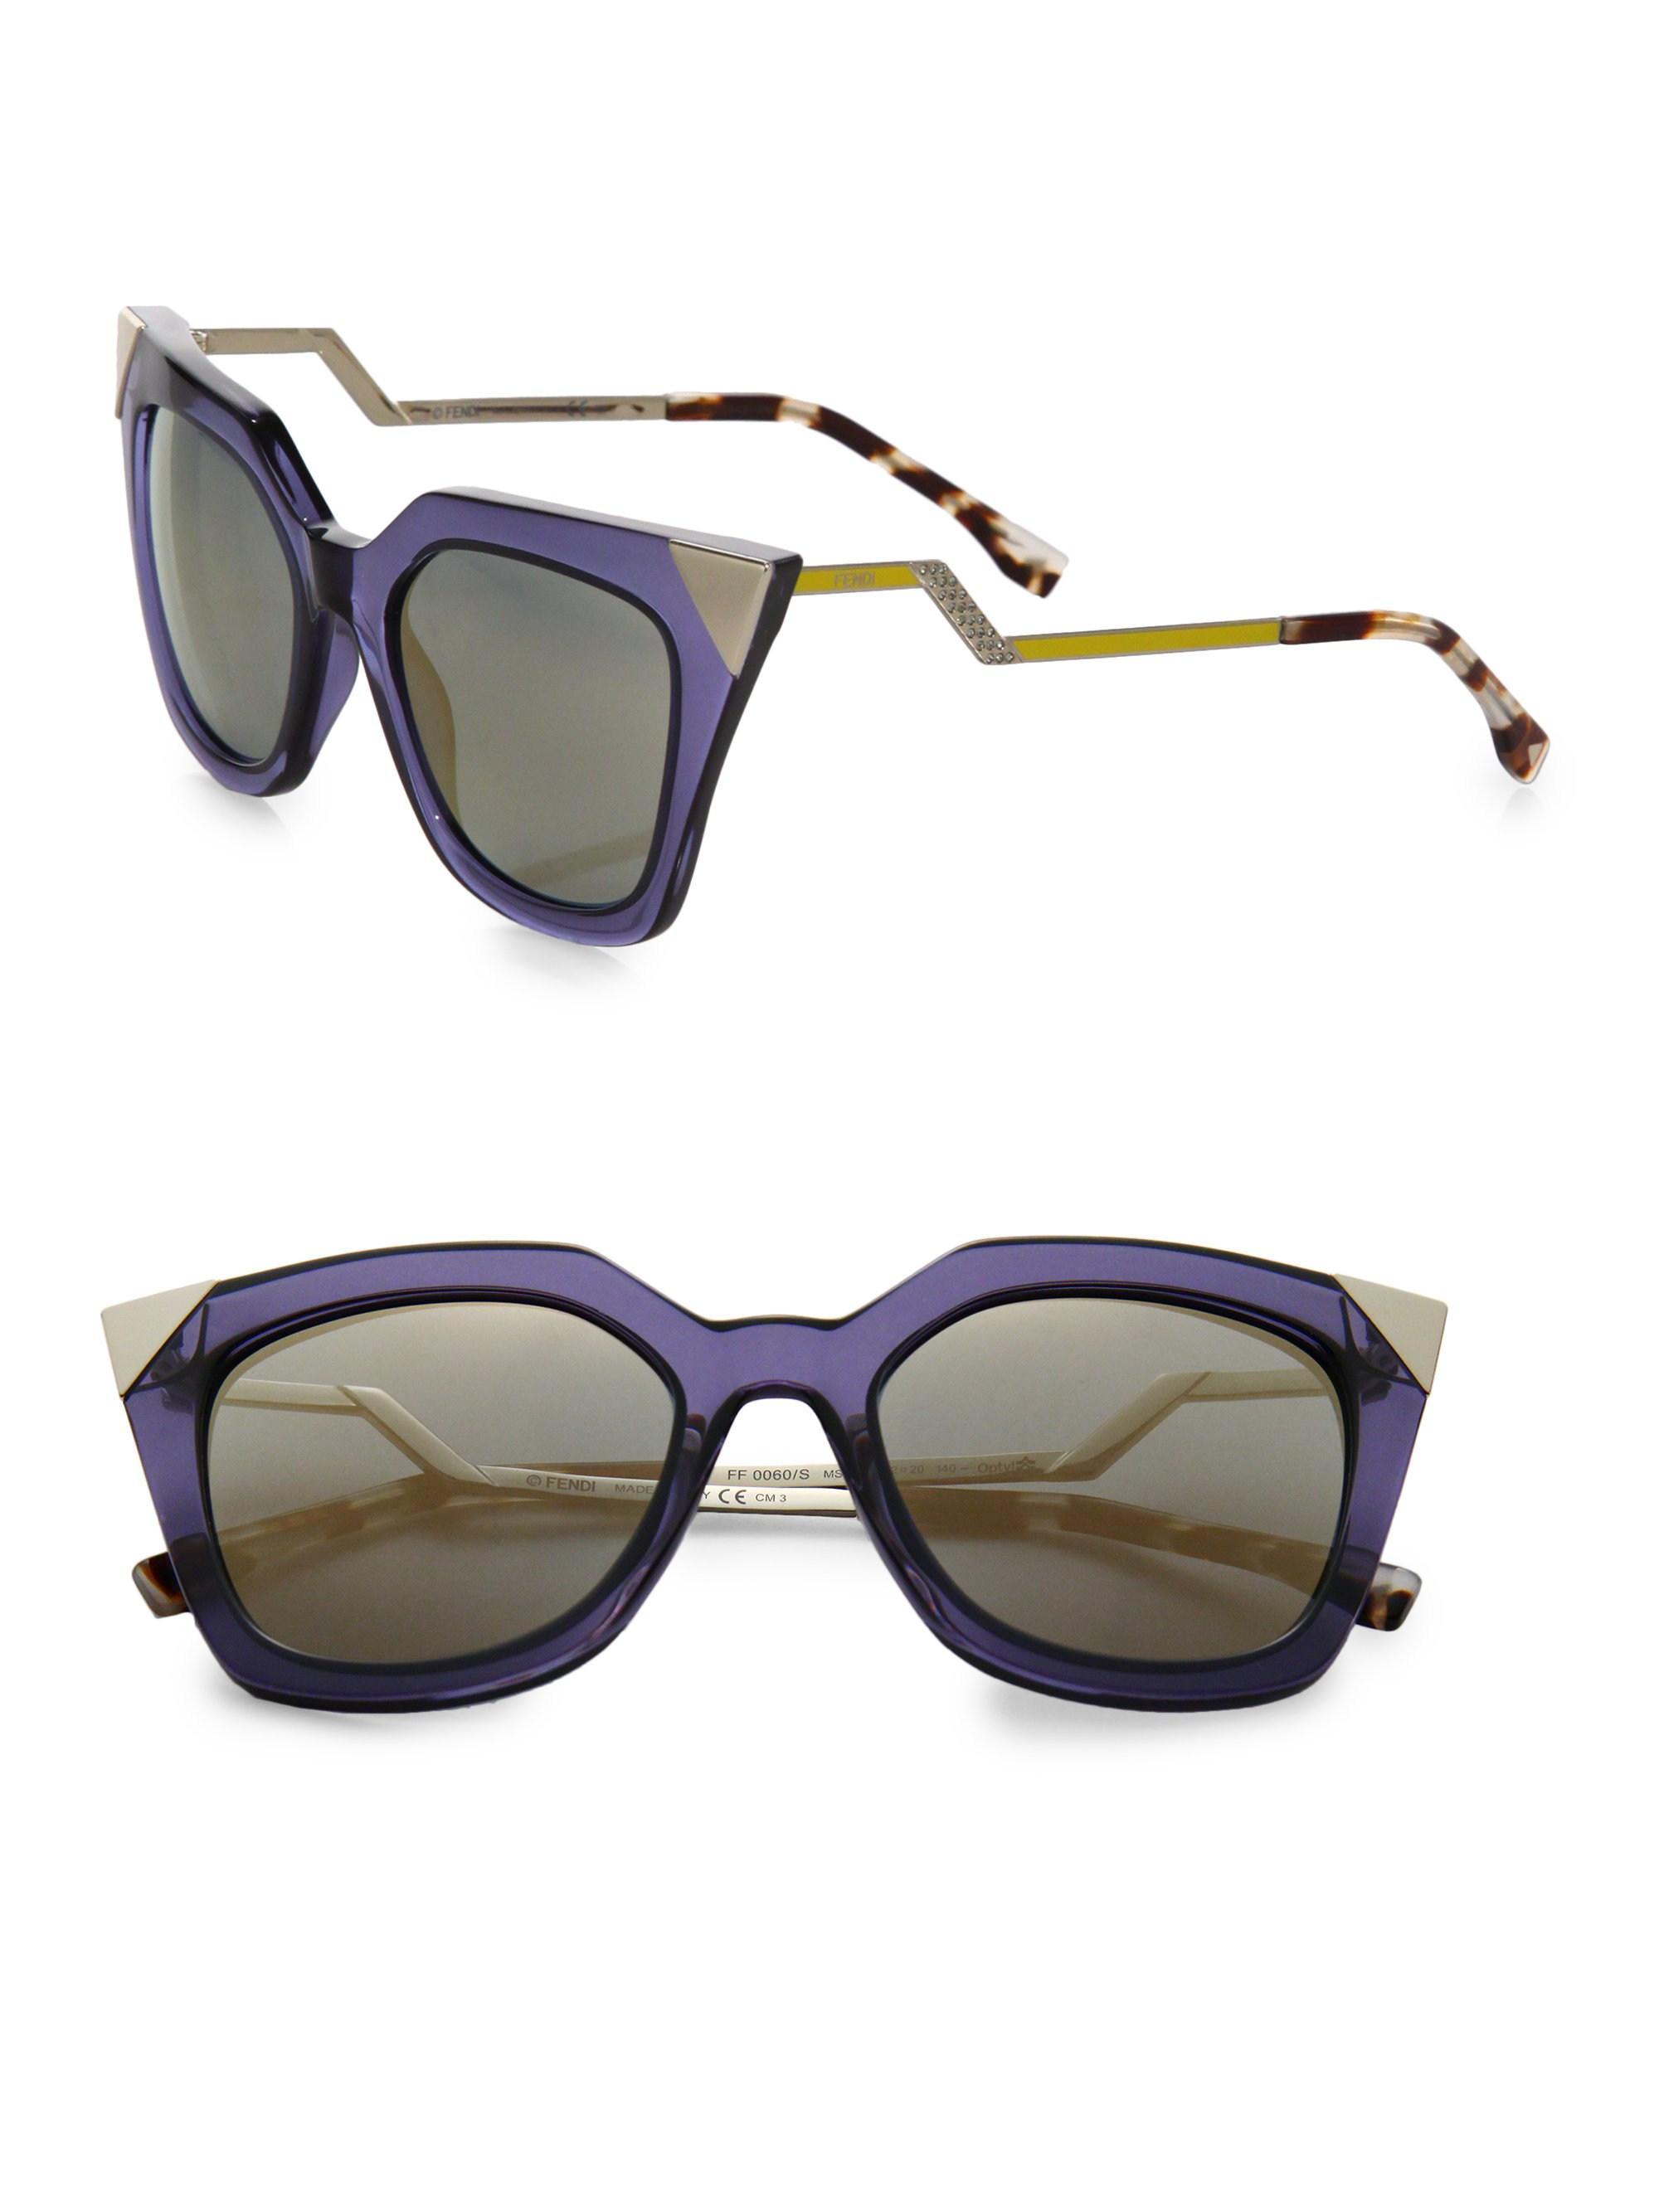 982718901e7 Lyst - Fendi Zig-zag 52mm Cat Eye Sunglasses - Black in Blue